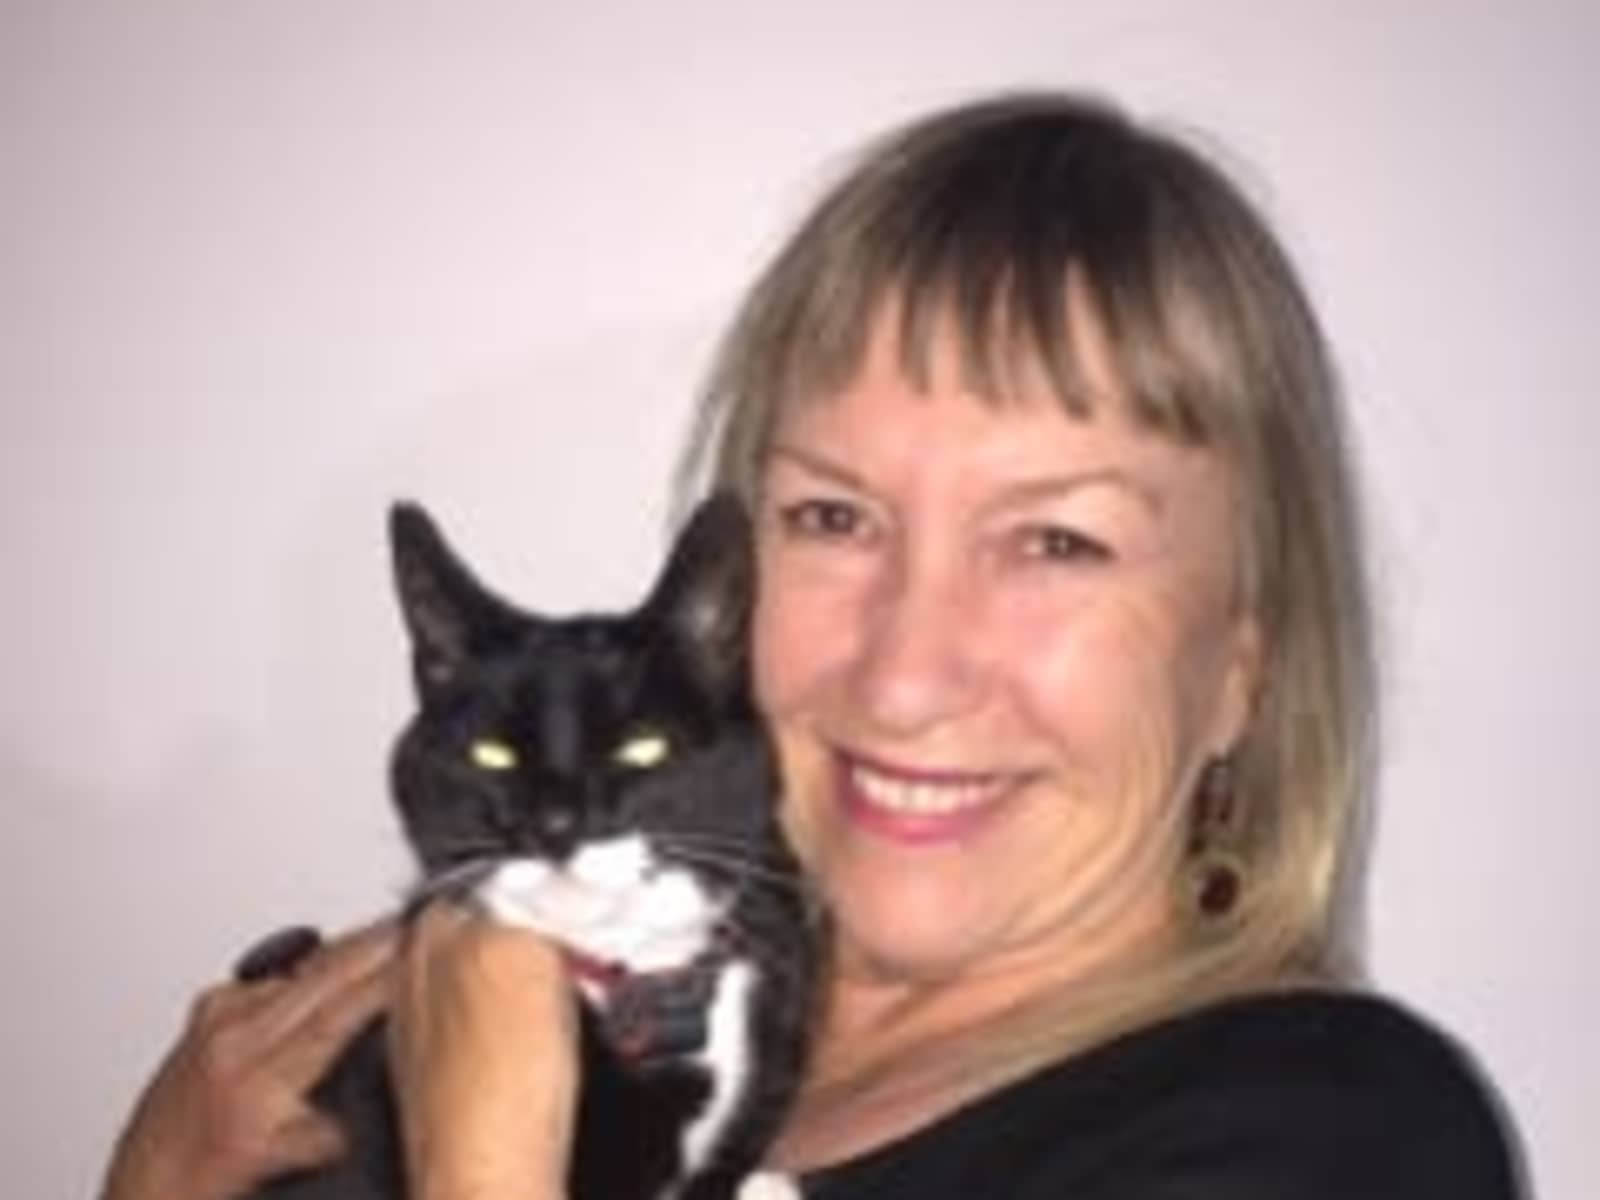 Susan from Melbourne, Victoria, Australia